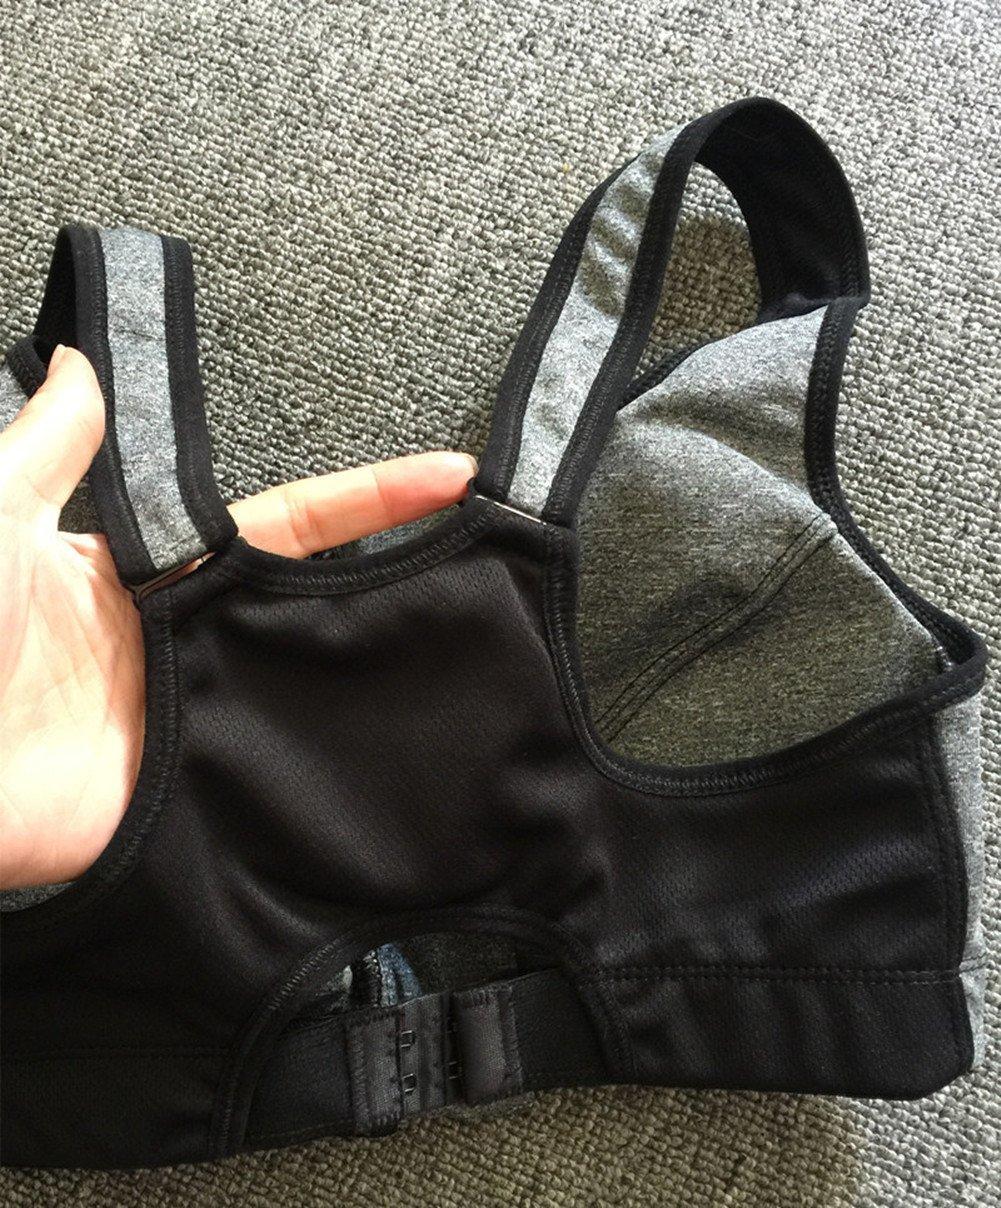 CRAZY Women's Sportswear Set Gym Jogging Bra Outfit Racerback Leggings Top+Pa... by Crazy (Image #3)